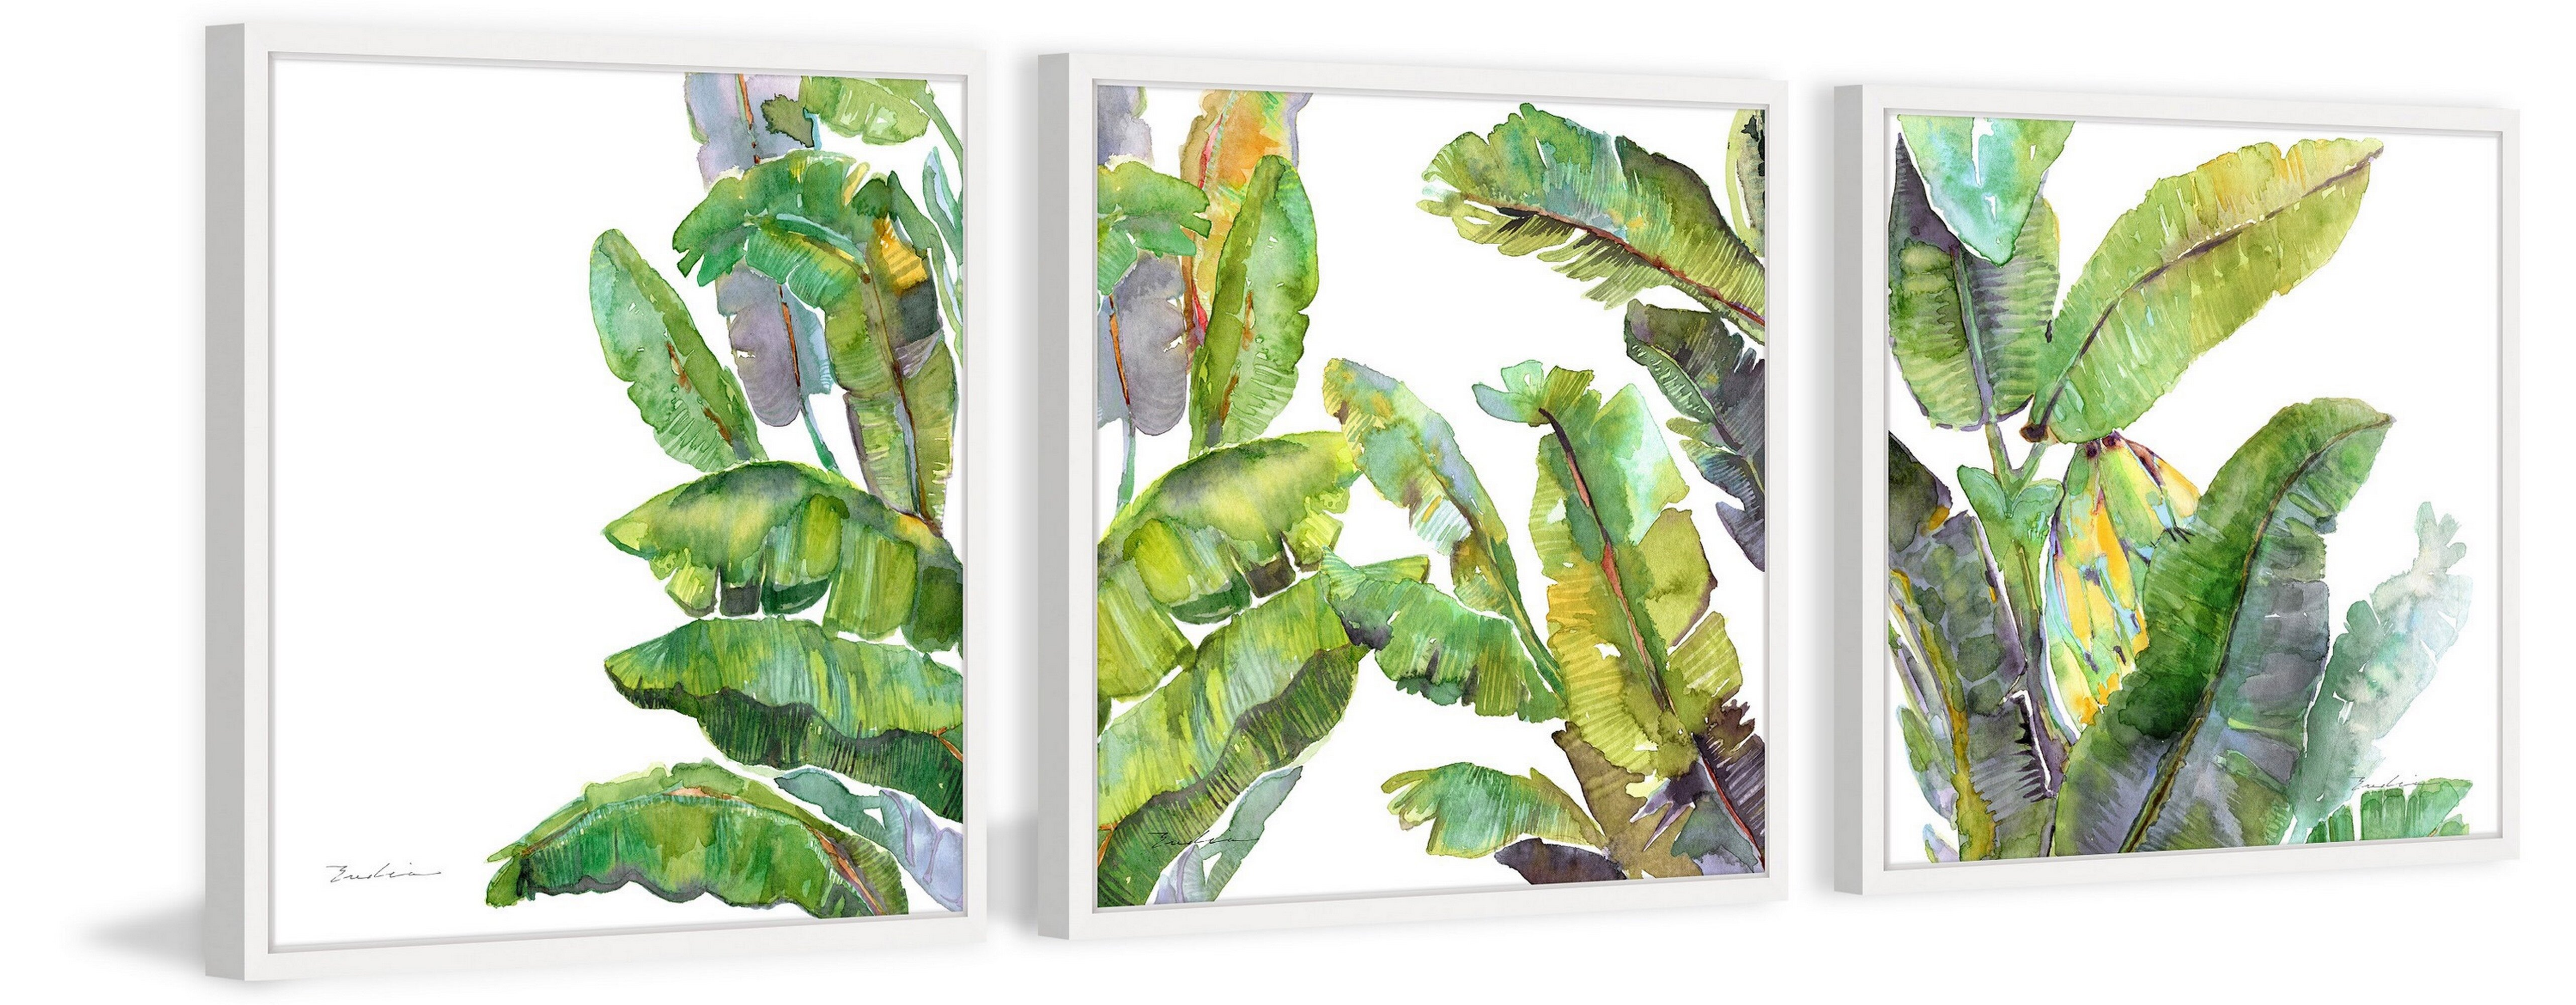 Bay Isle Home Oh Banana Leaves Iii Triptych By Evelia Watercolor Painting Framed Print Set Wayfair